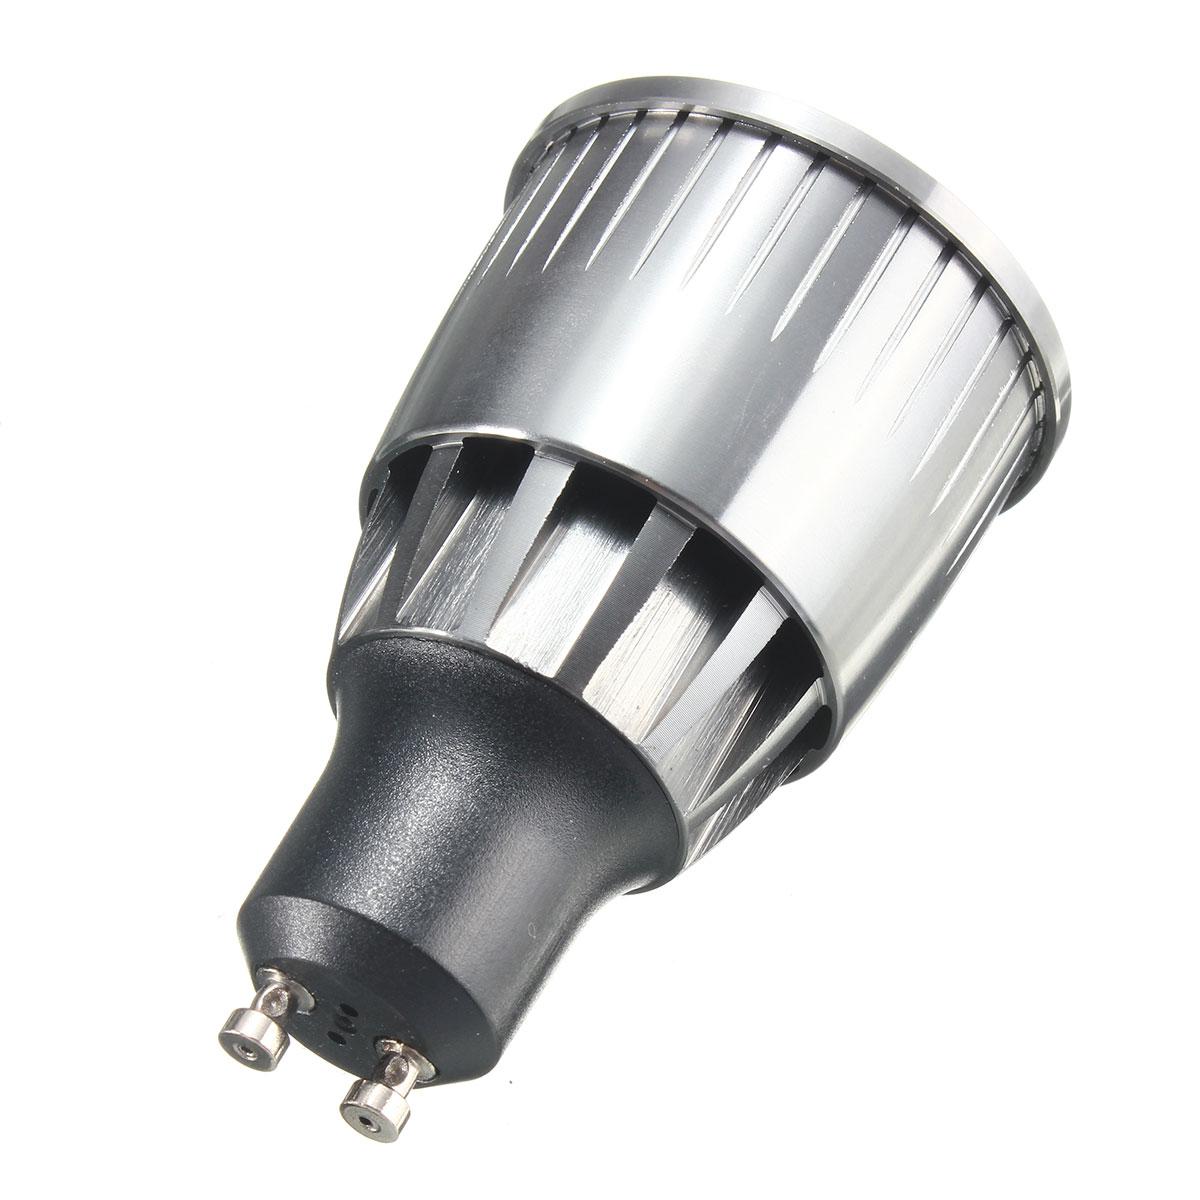 led ultra bright dimmable 7w 600lm gu10 cob led spot light bulb ac 110 220v sale. Black Bedroom Furniture Sets. Home Design Ideas